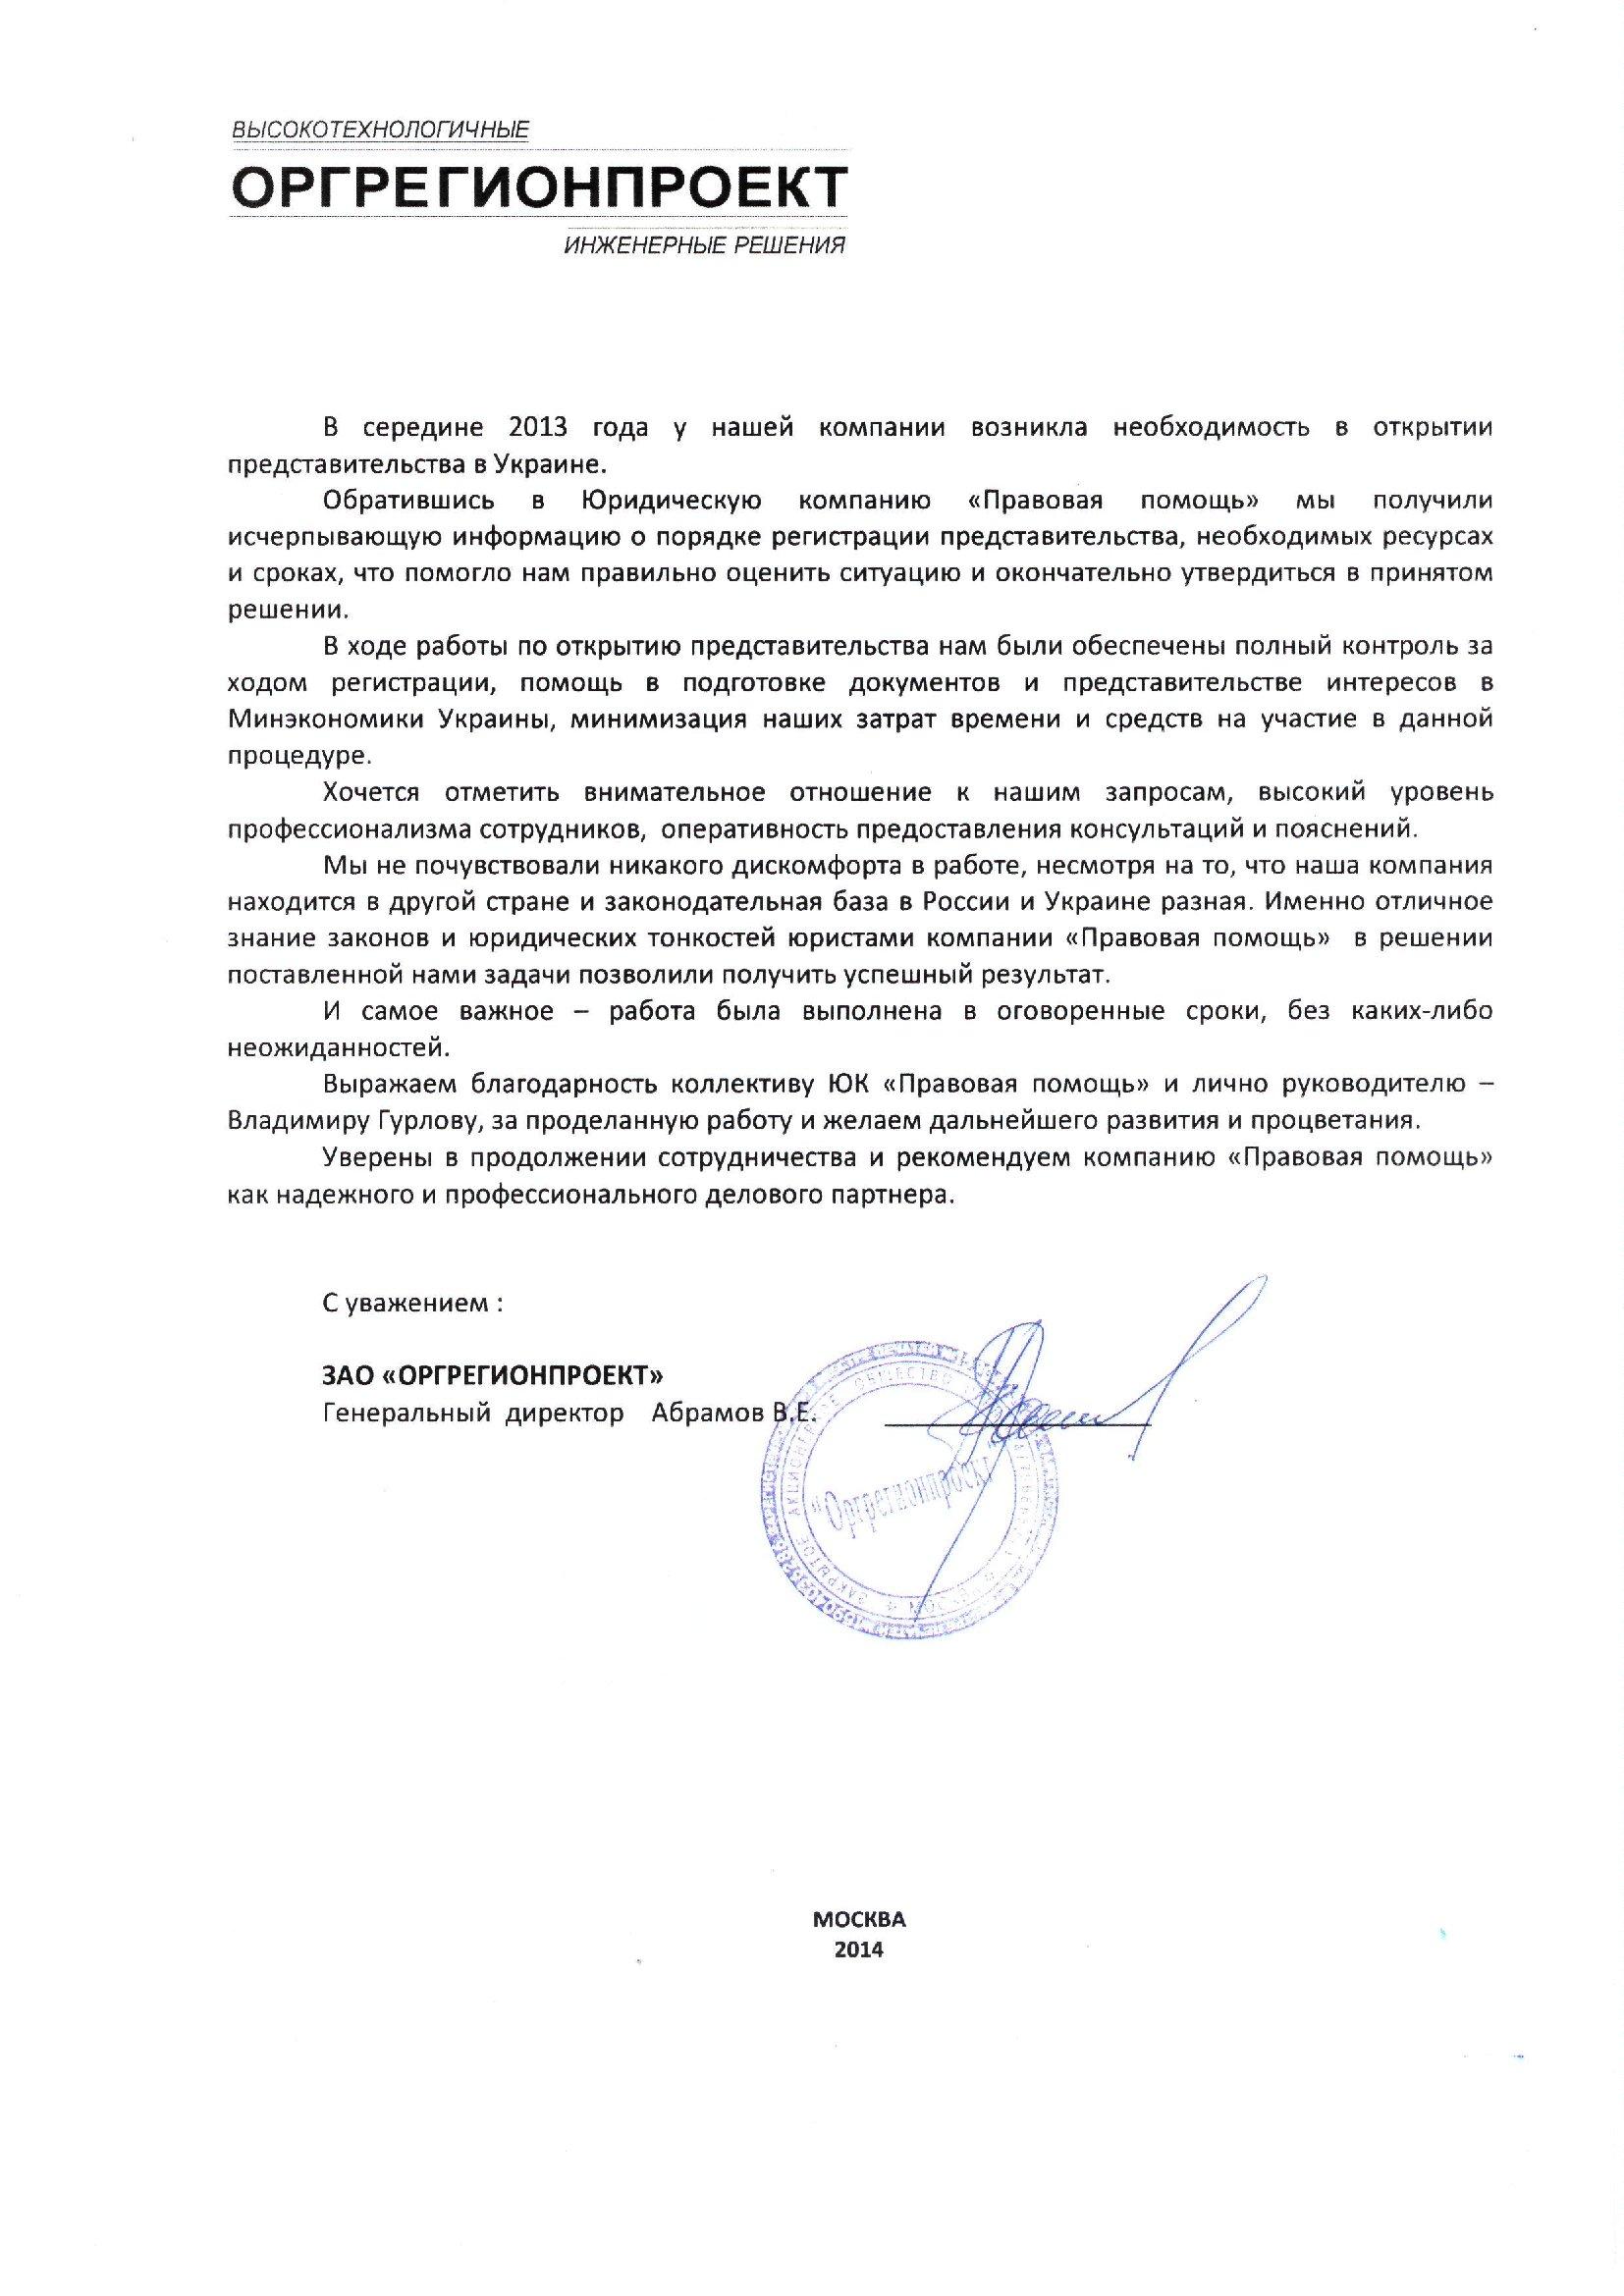 Law firm in ukraine general manager v abramov pjsc orgregionproekt stopboris Choice Image